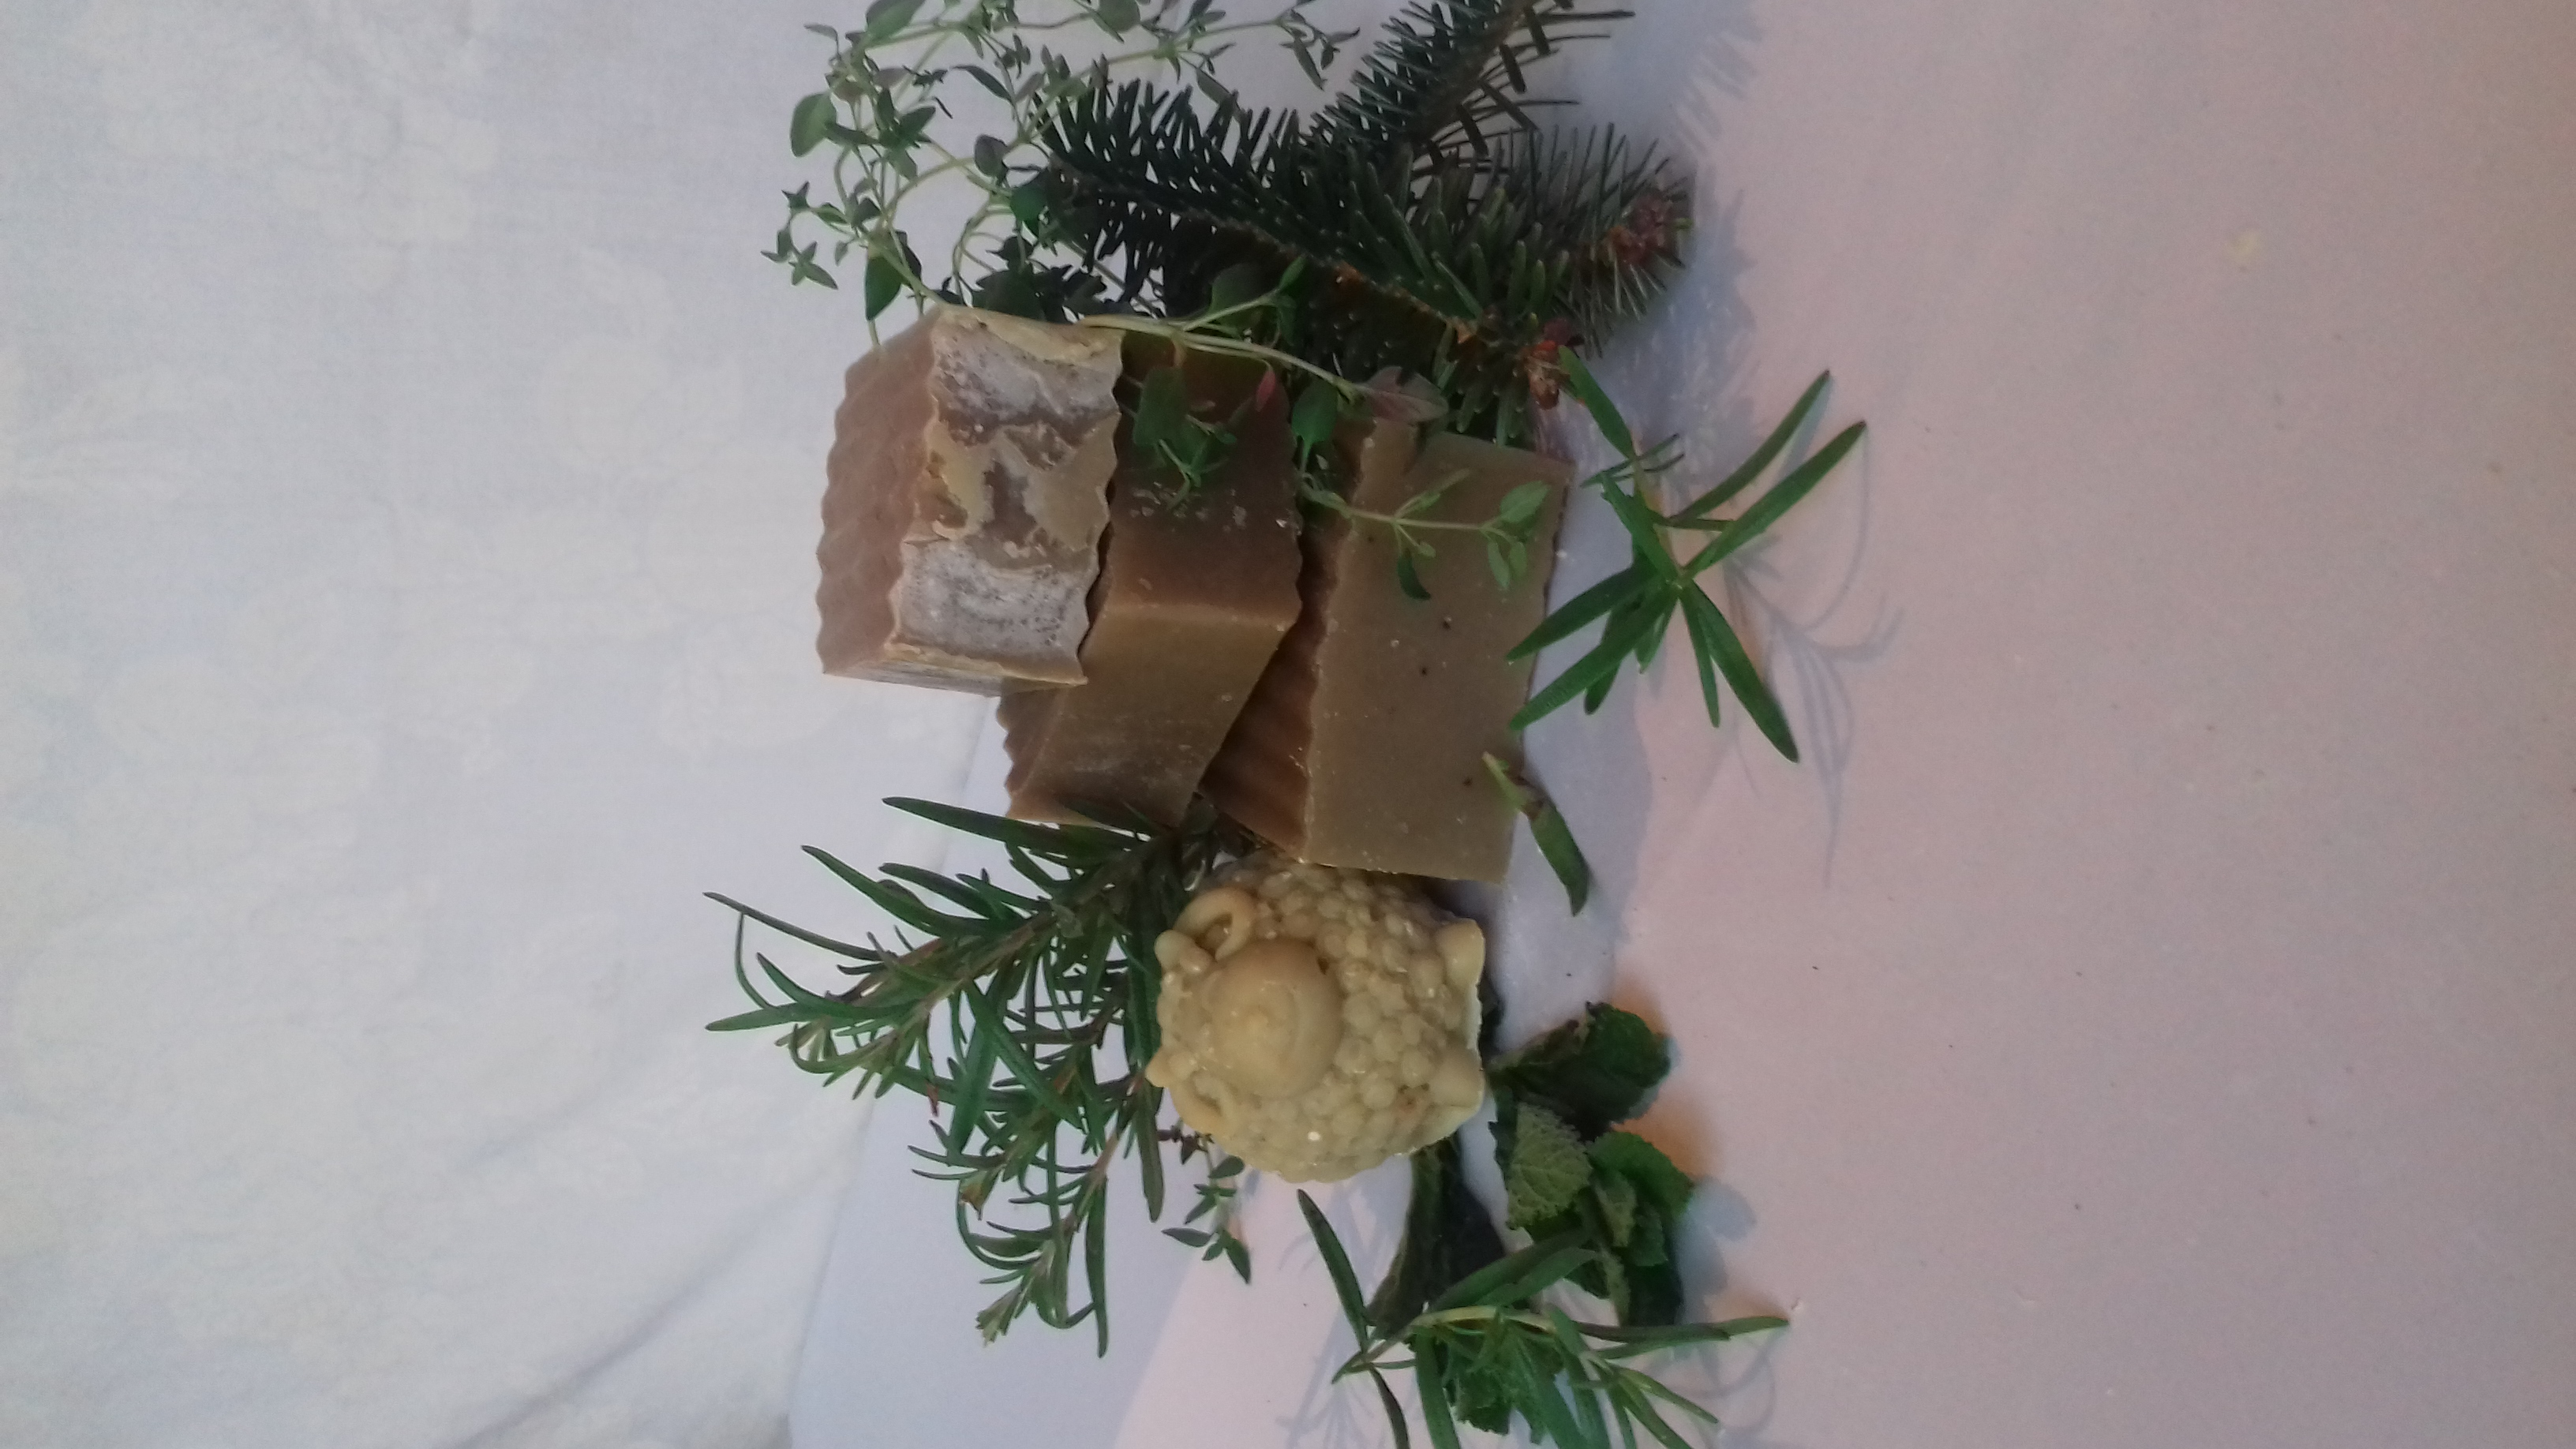 Blue Leaf Soap Ministry, Southampton, England, UK,natural soap